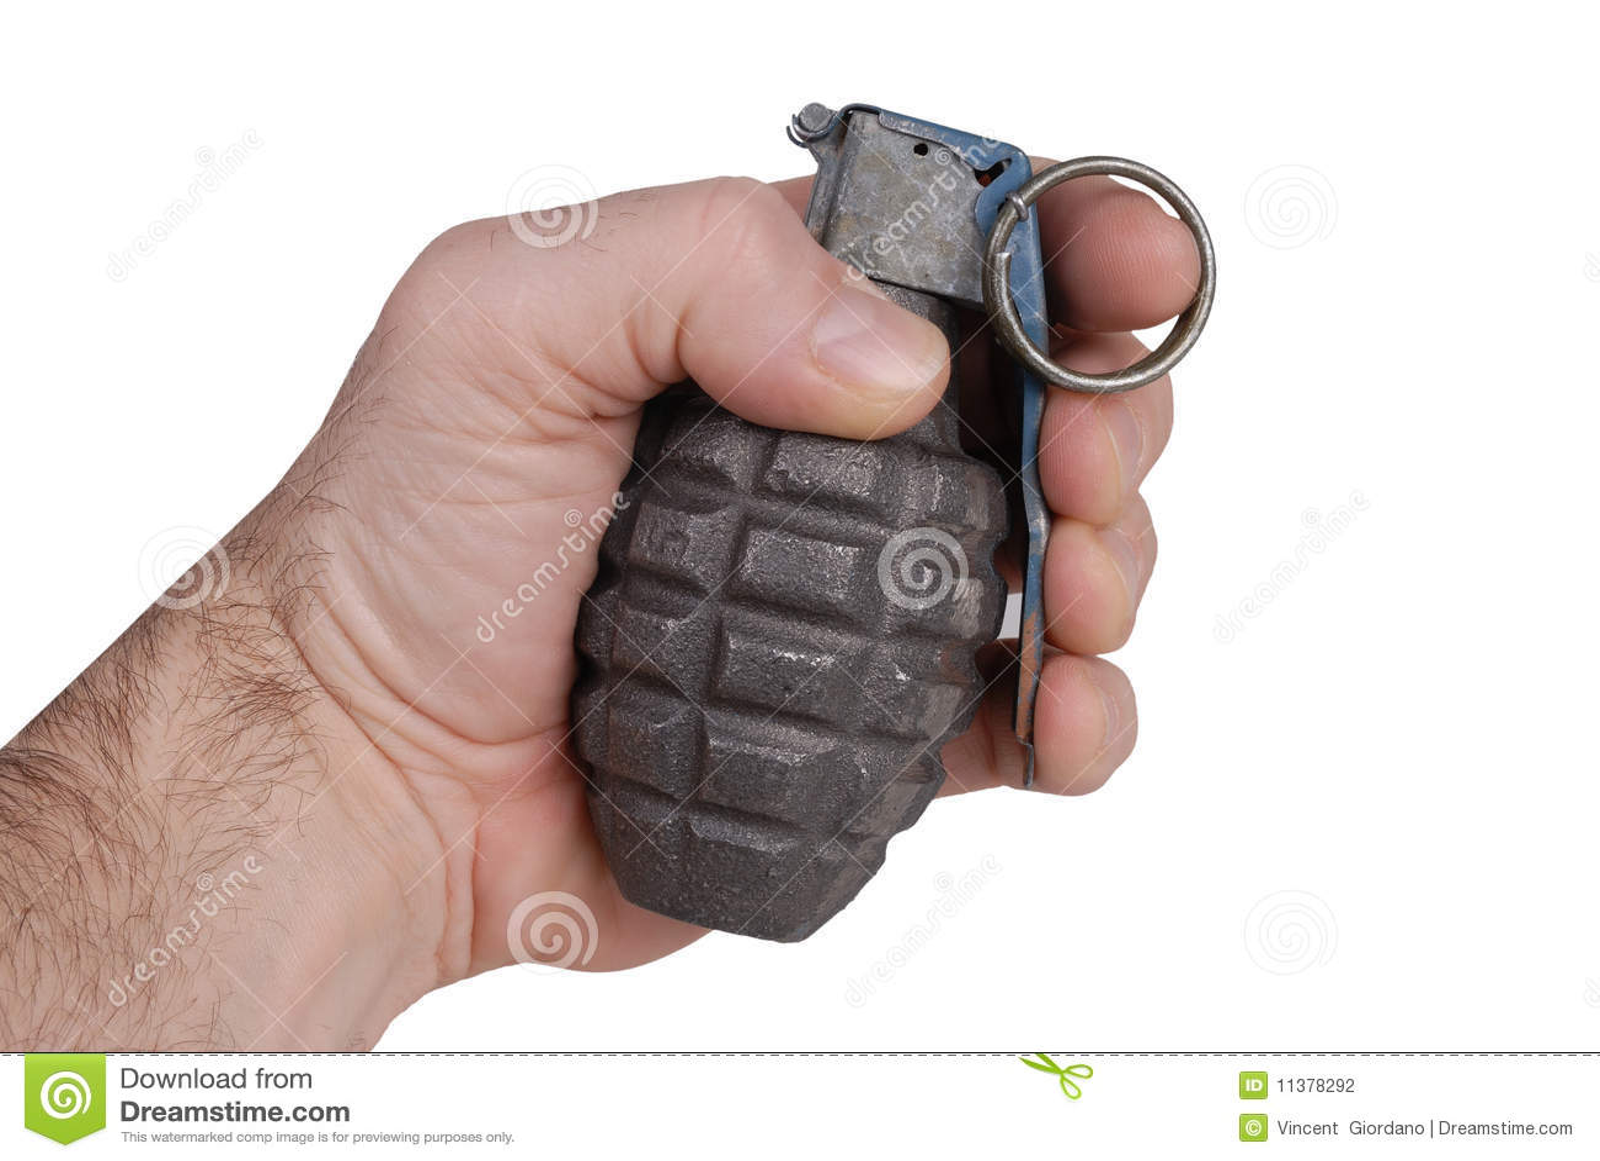 granada mano: